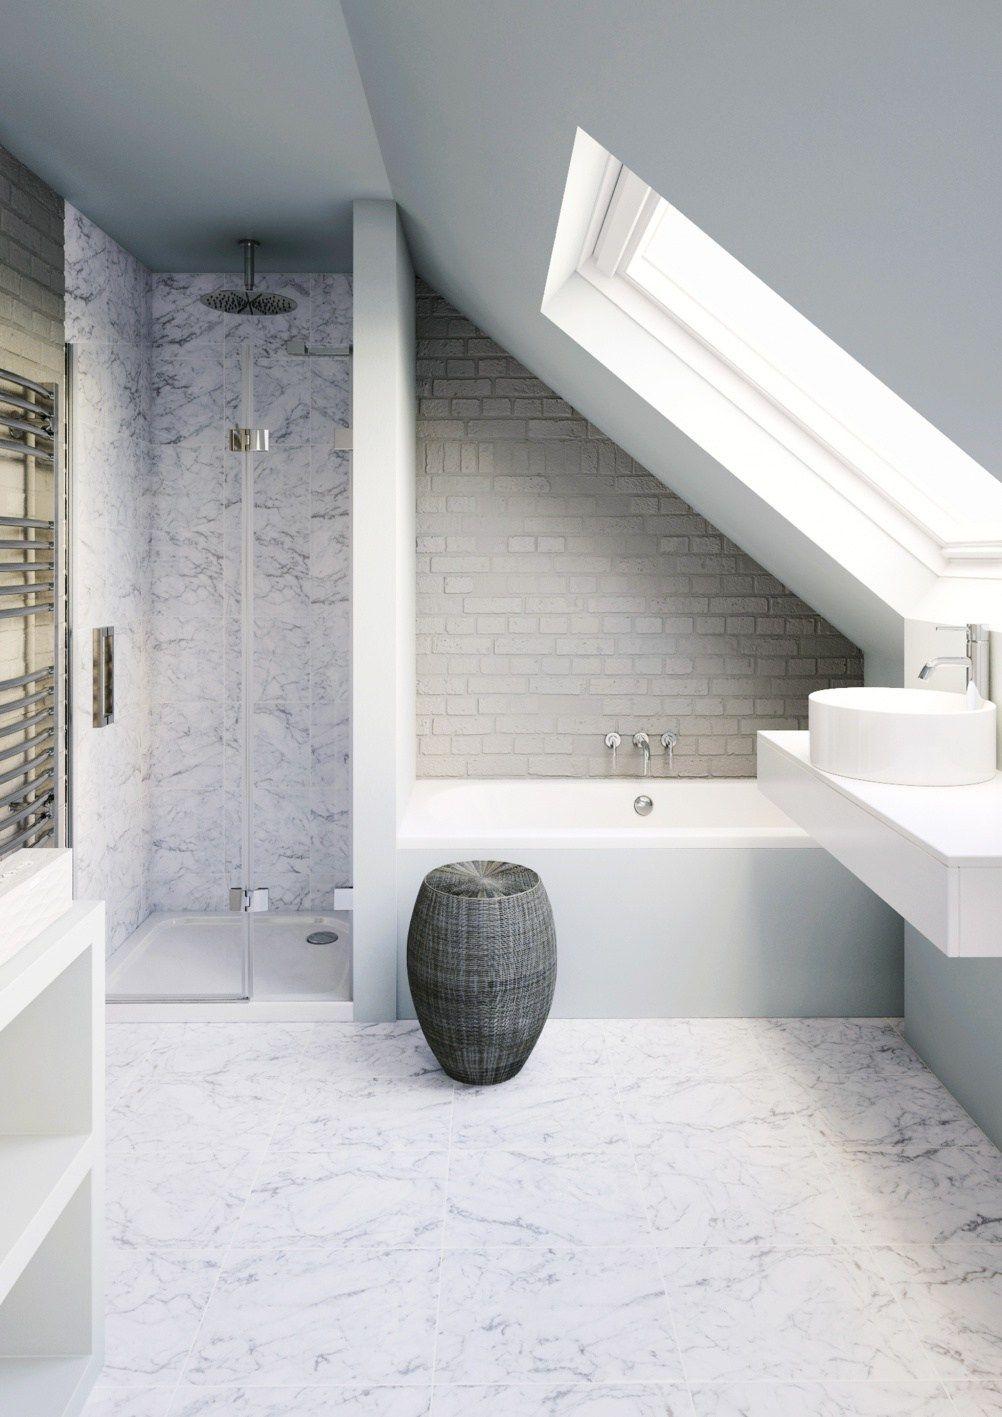 Loft Conversion Bathroom Ideas Kids Room Ideas Small Apartment Bathroom Sloped Ceiling Bathroom Small Attic Bathroom